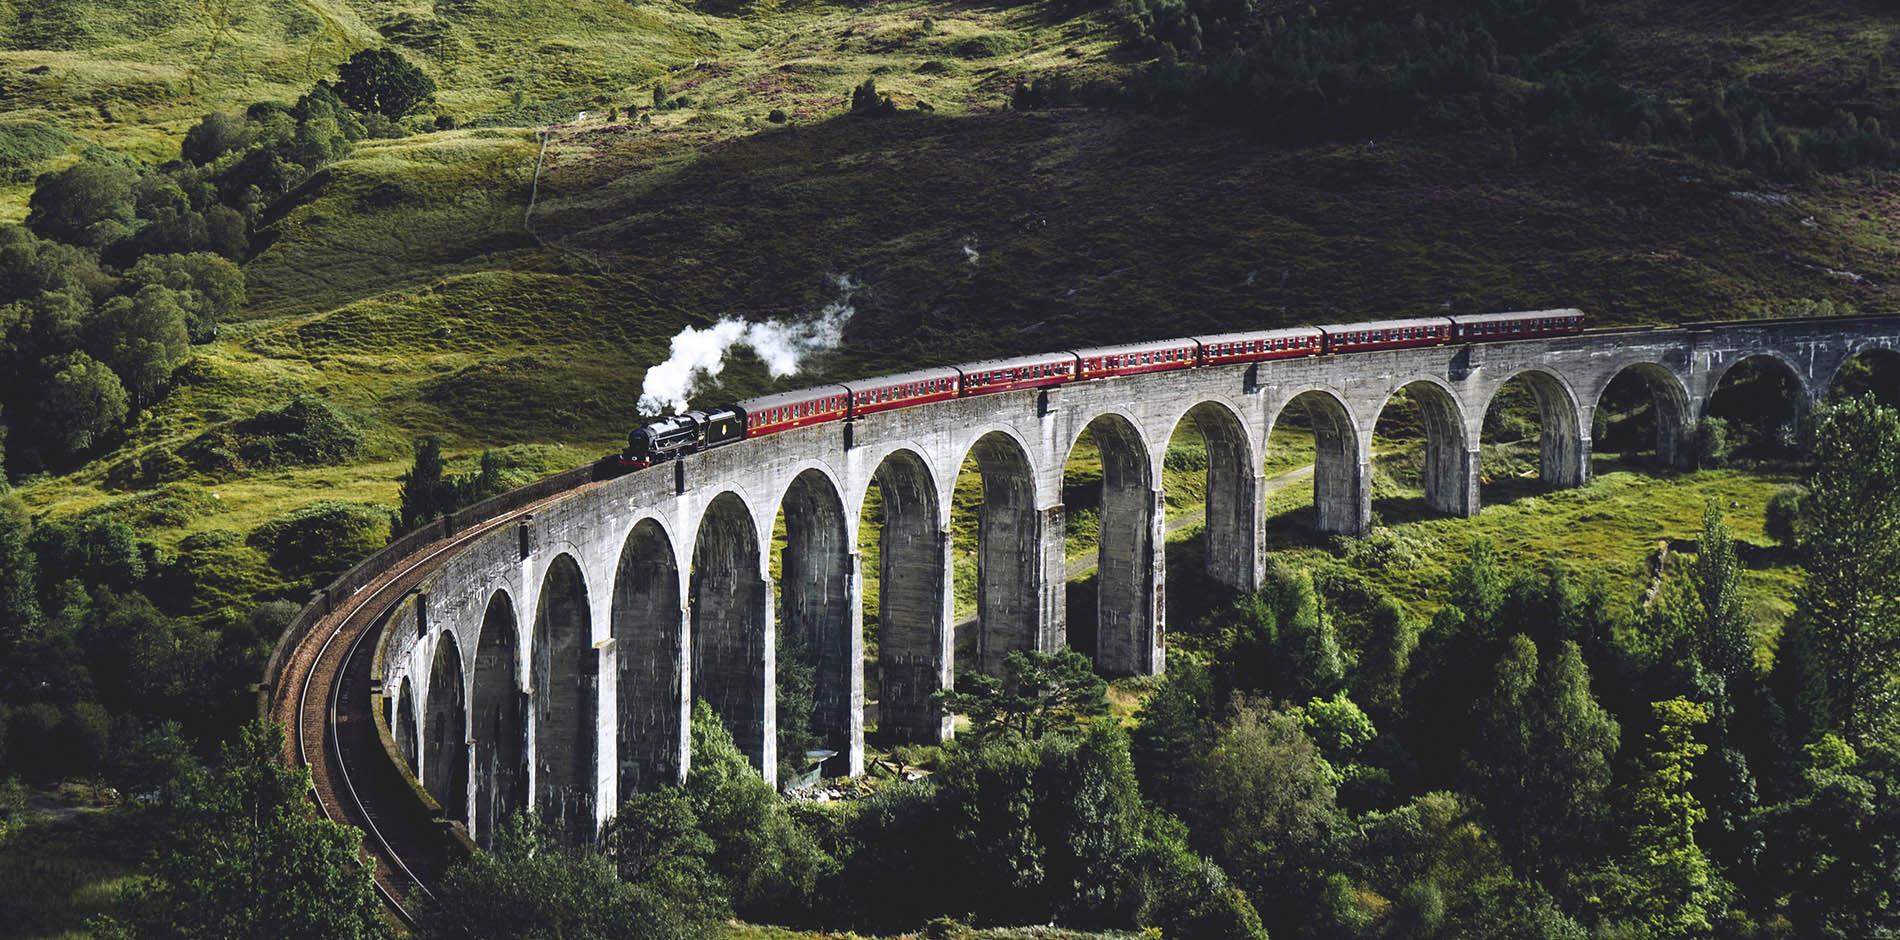 garnica_contrachapado_fireshield_train_5